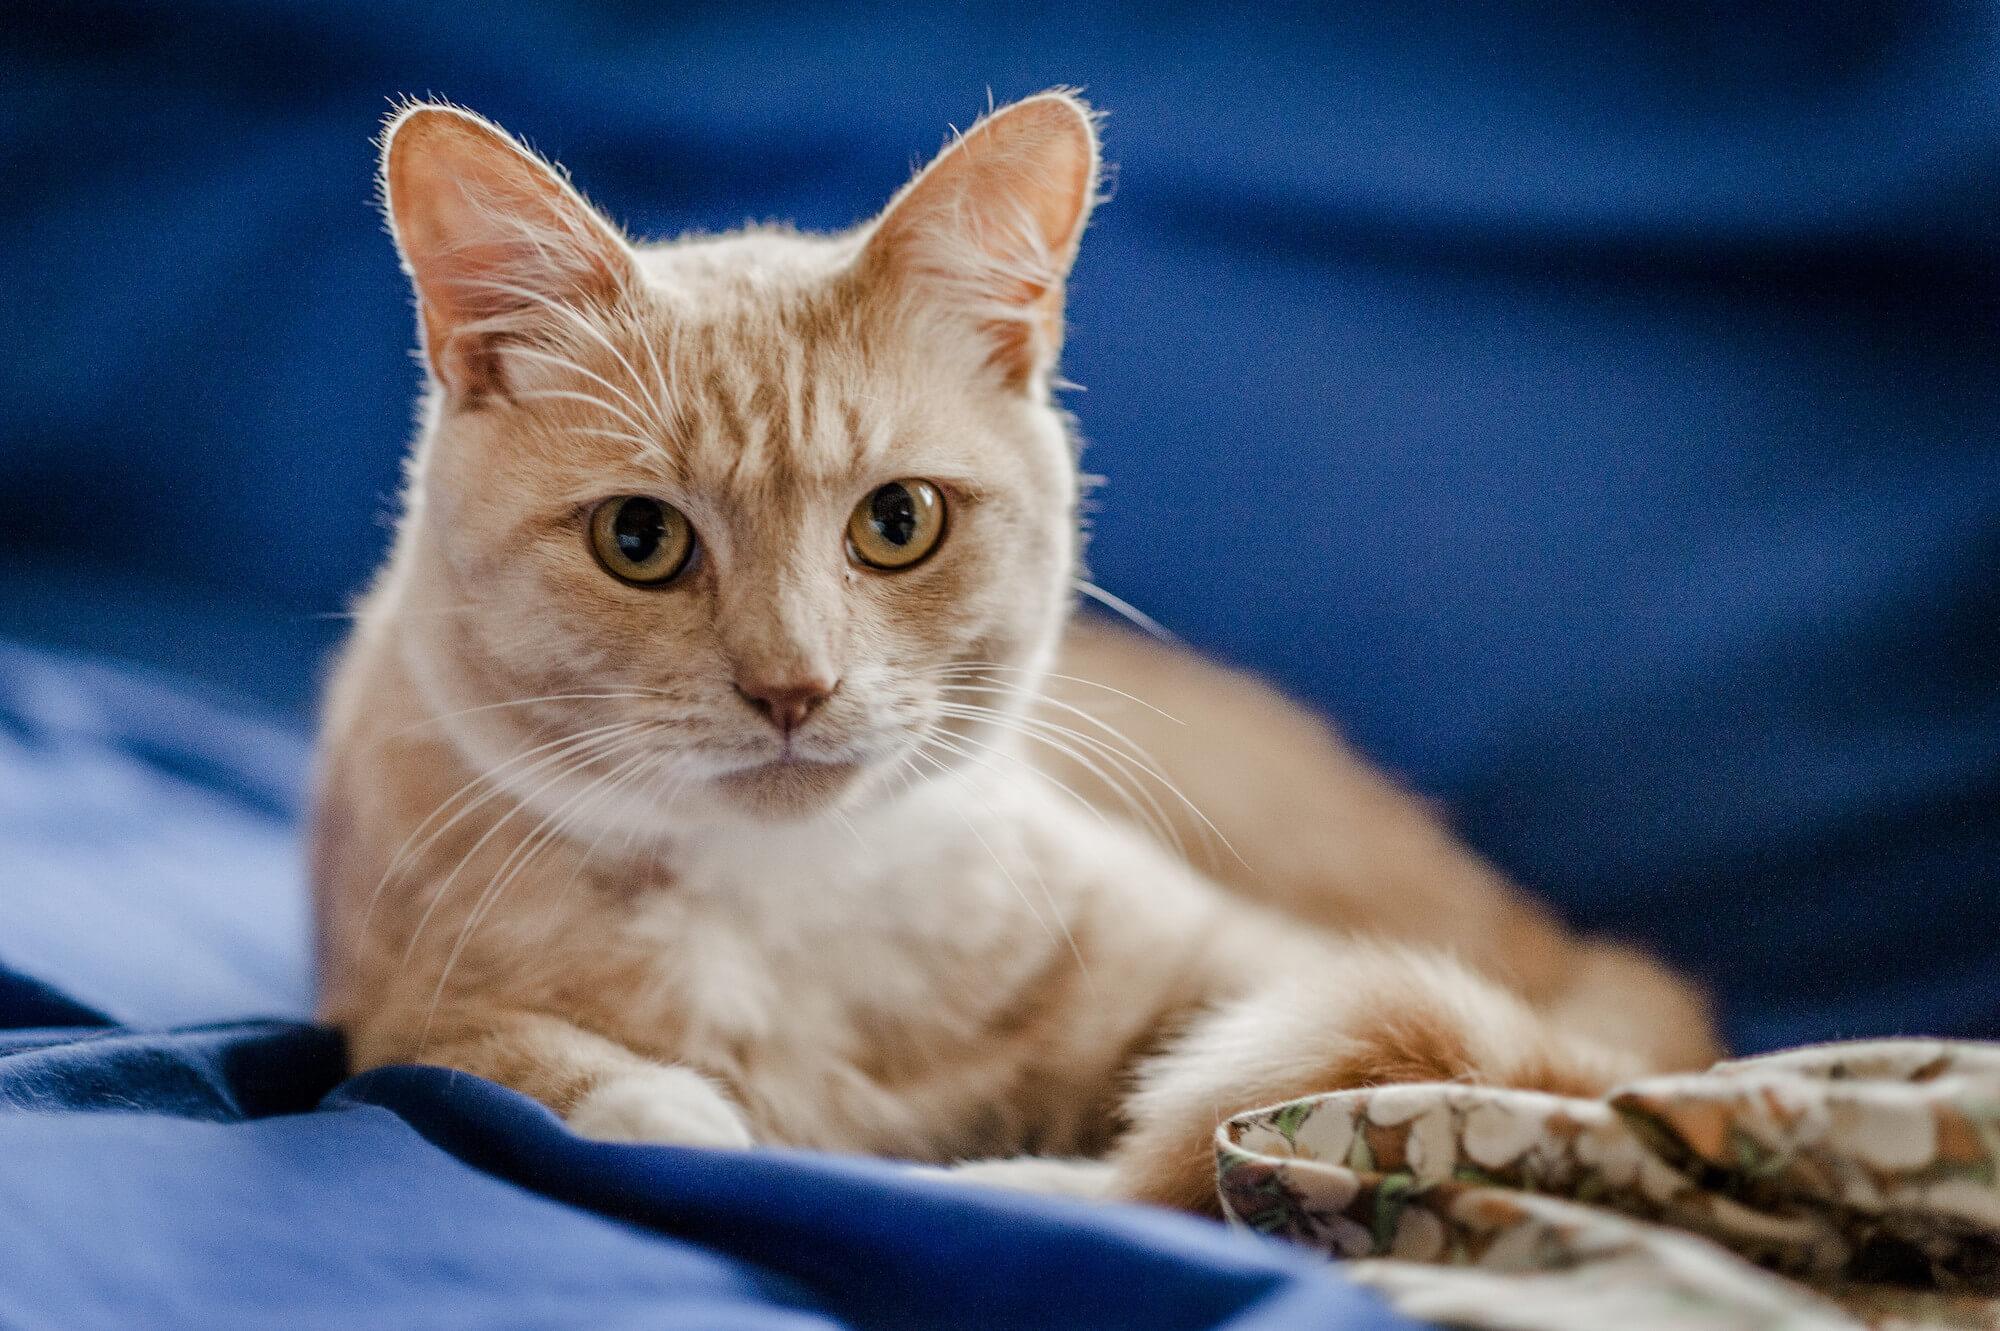 Penyebab Flu Pada Kucing